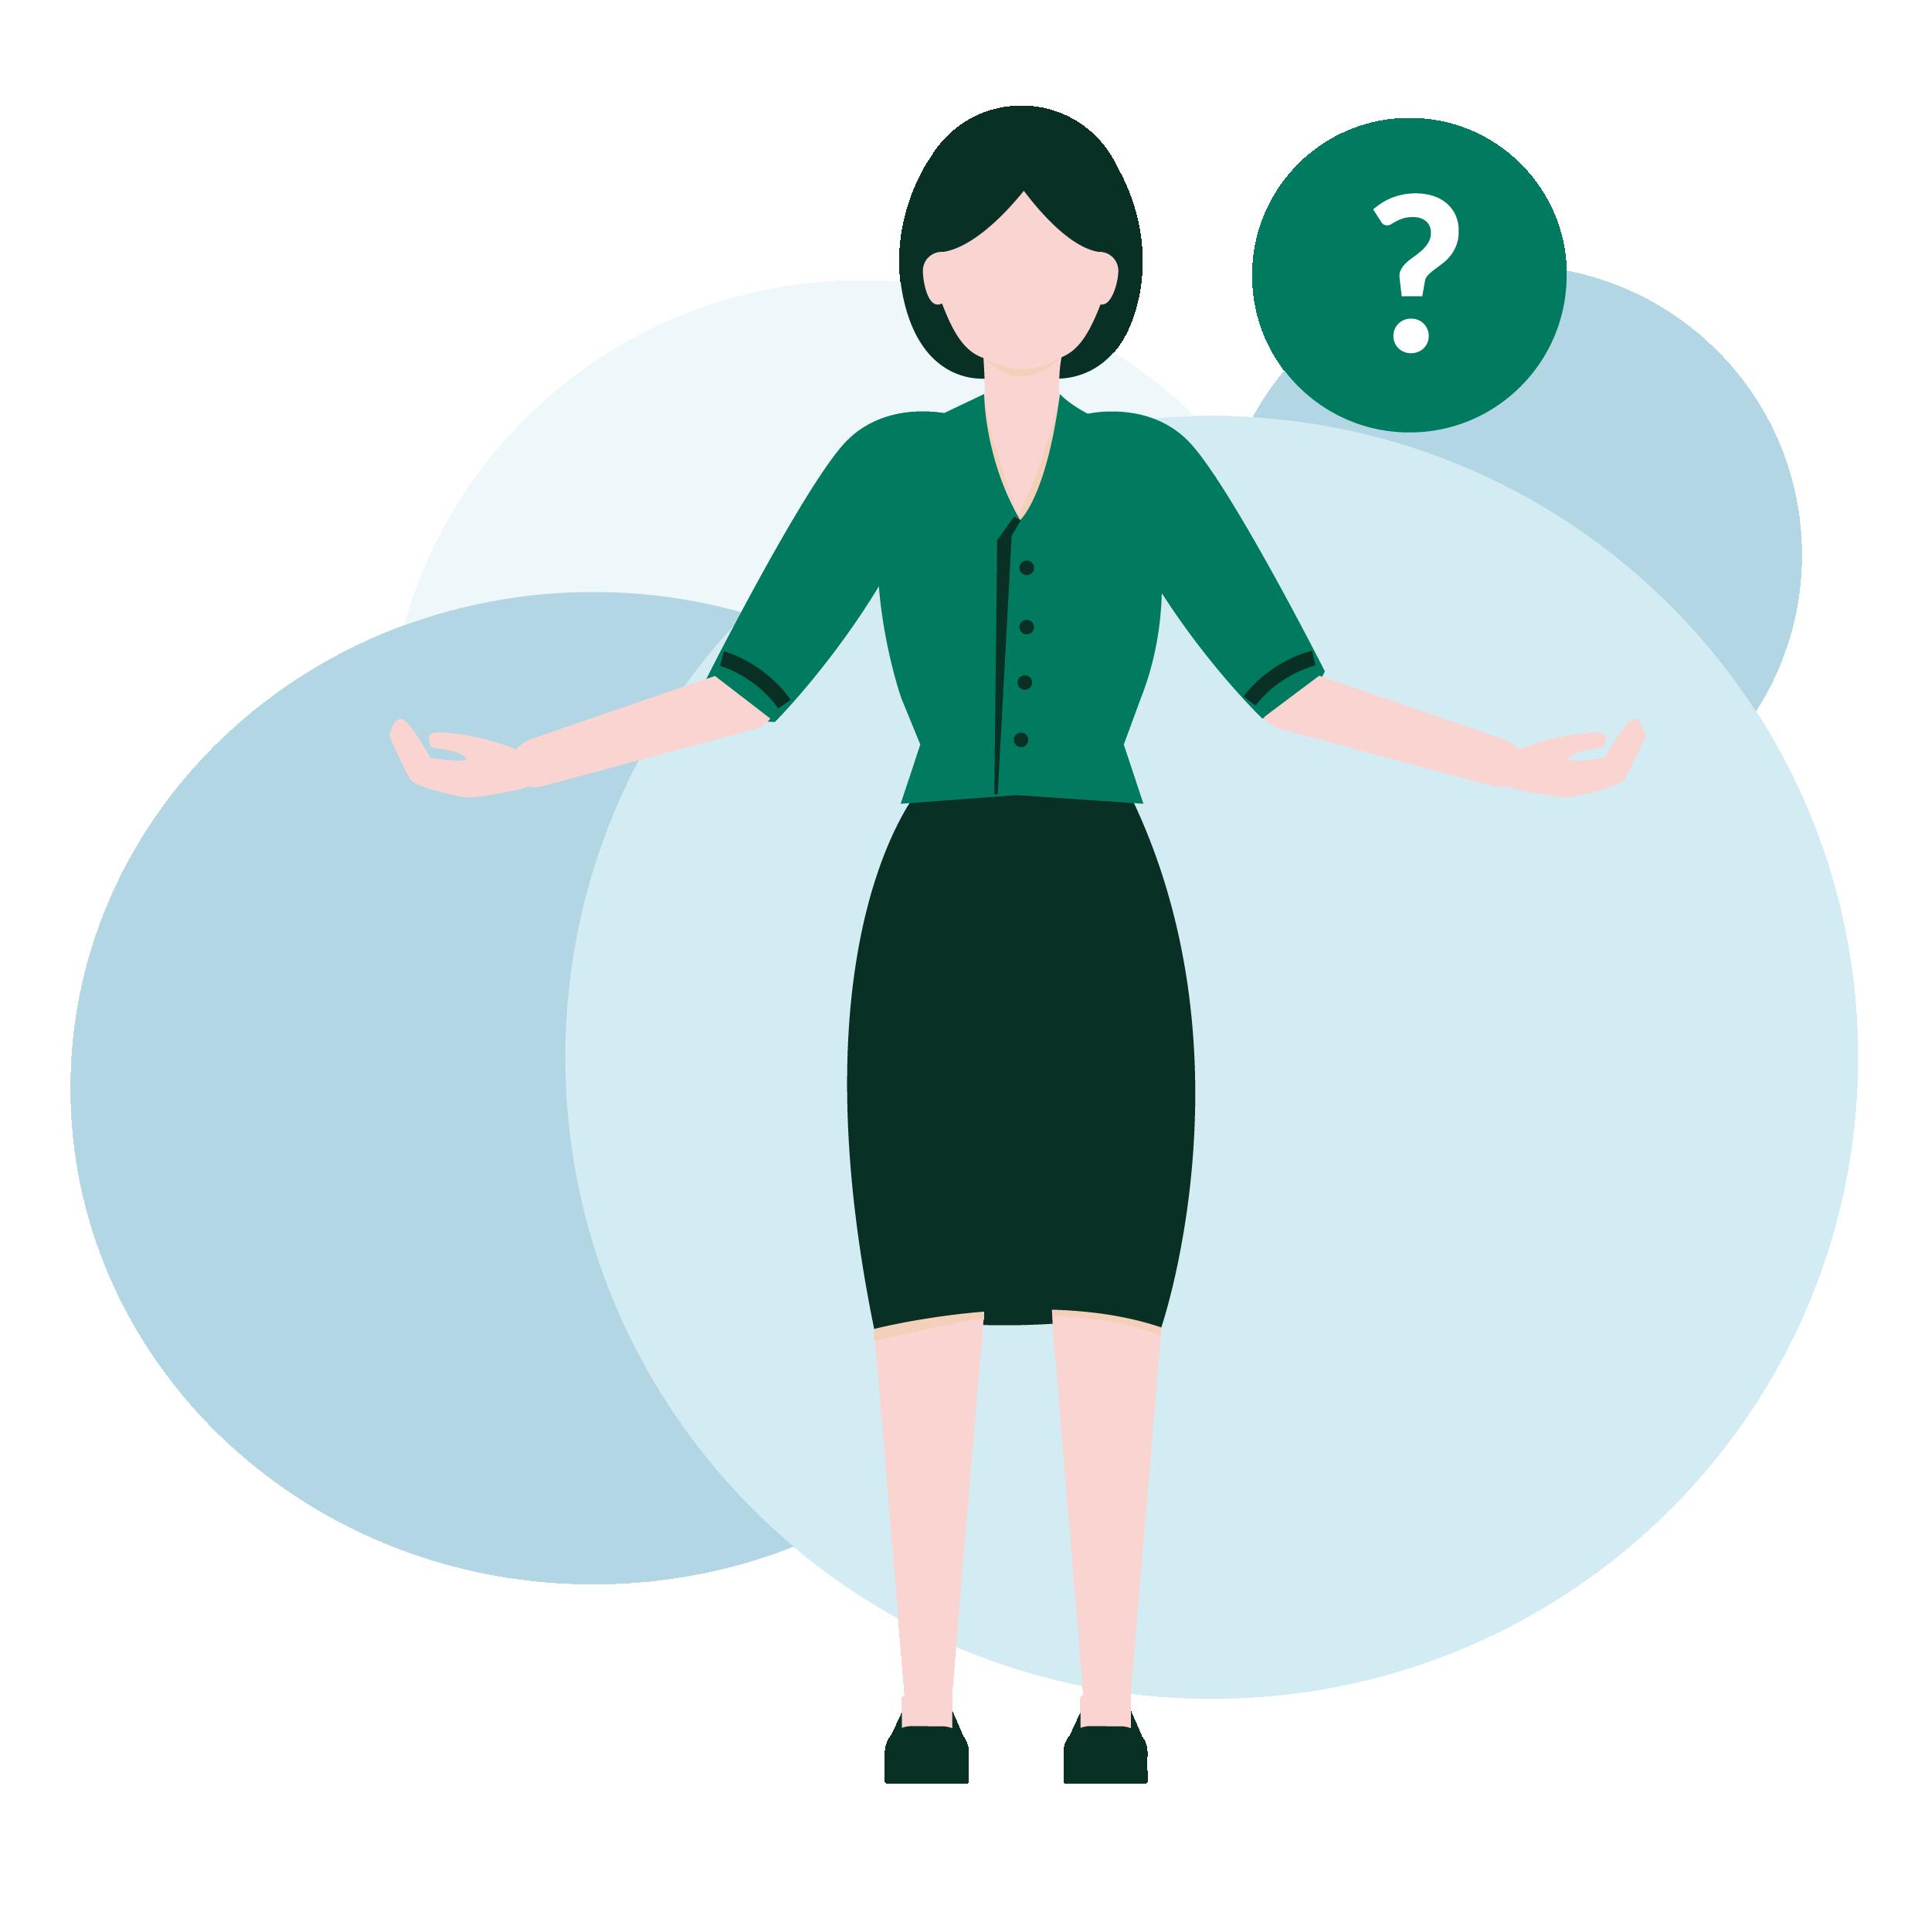 Hvem kan bli miljøfyrtårn? Og hvordan bli sertifisert?